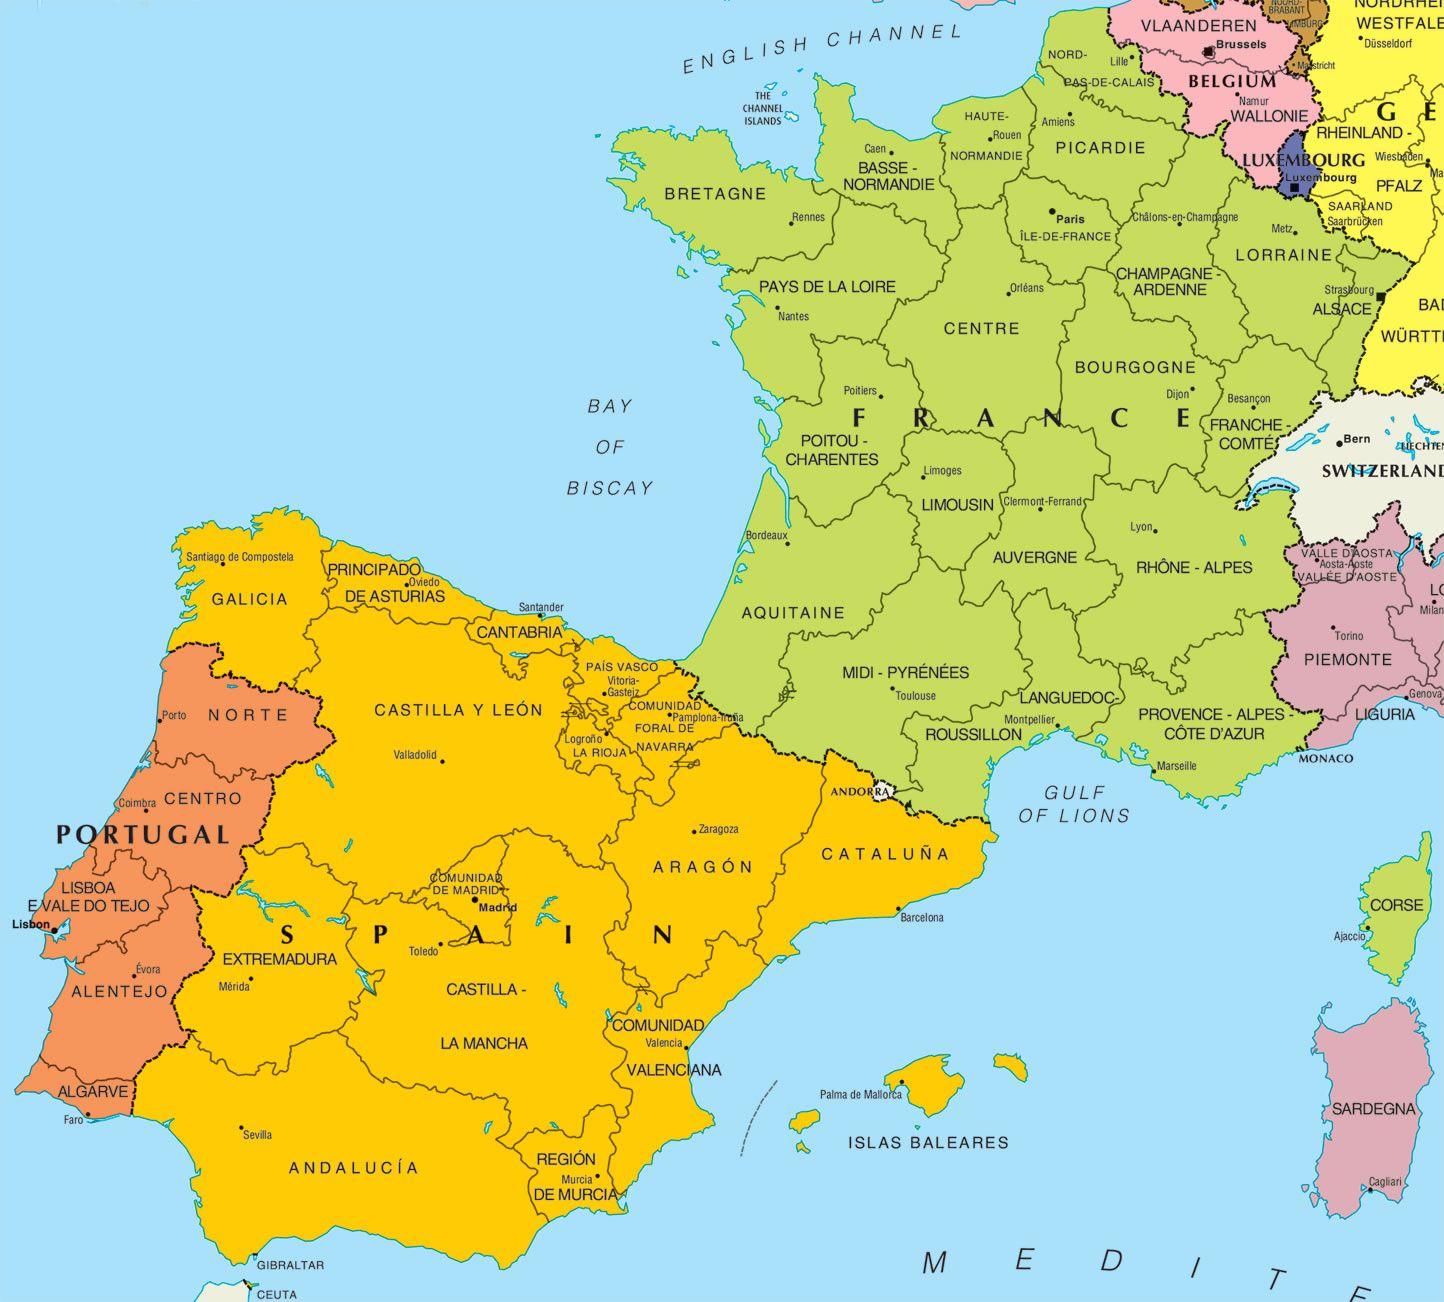 Carte France Espagne Vierge Tonaartsenfotografie Voyage Espagne